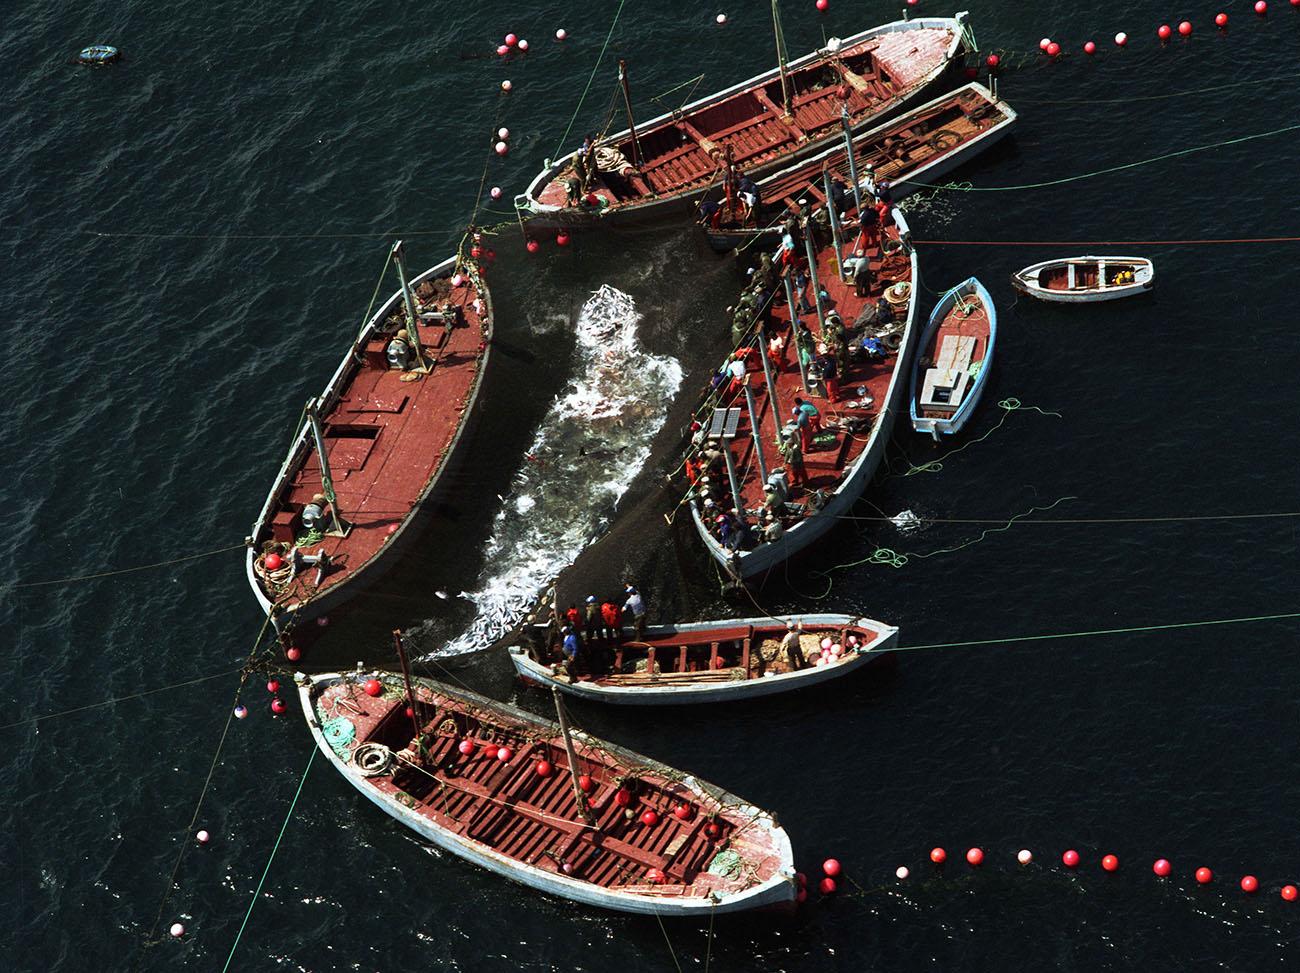 Tarifa: Barcos pescando (2). Foto: M. Rojas